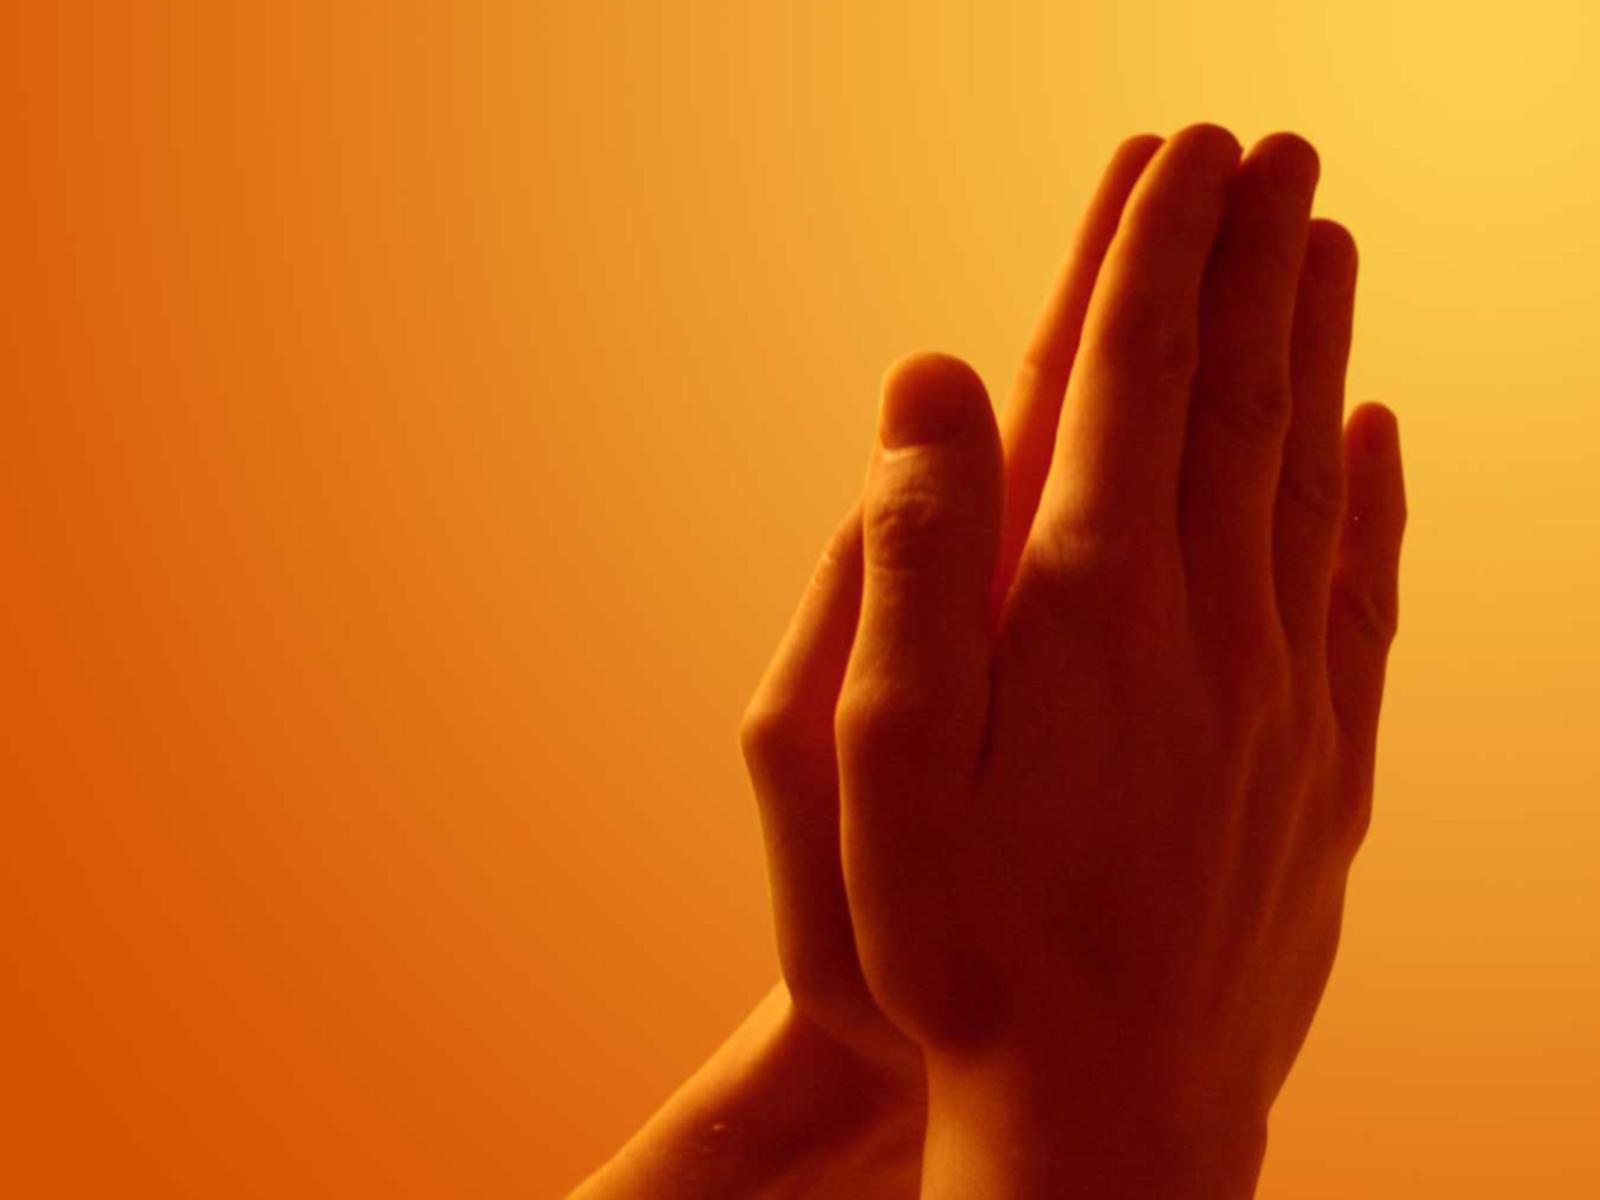 Child Prayer Hands A call to prayer: reclaiming